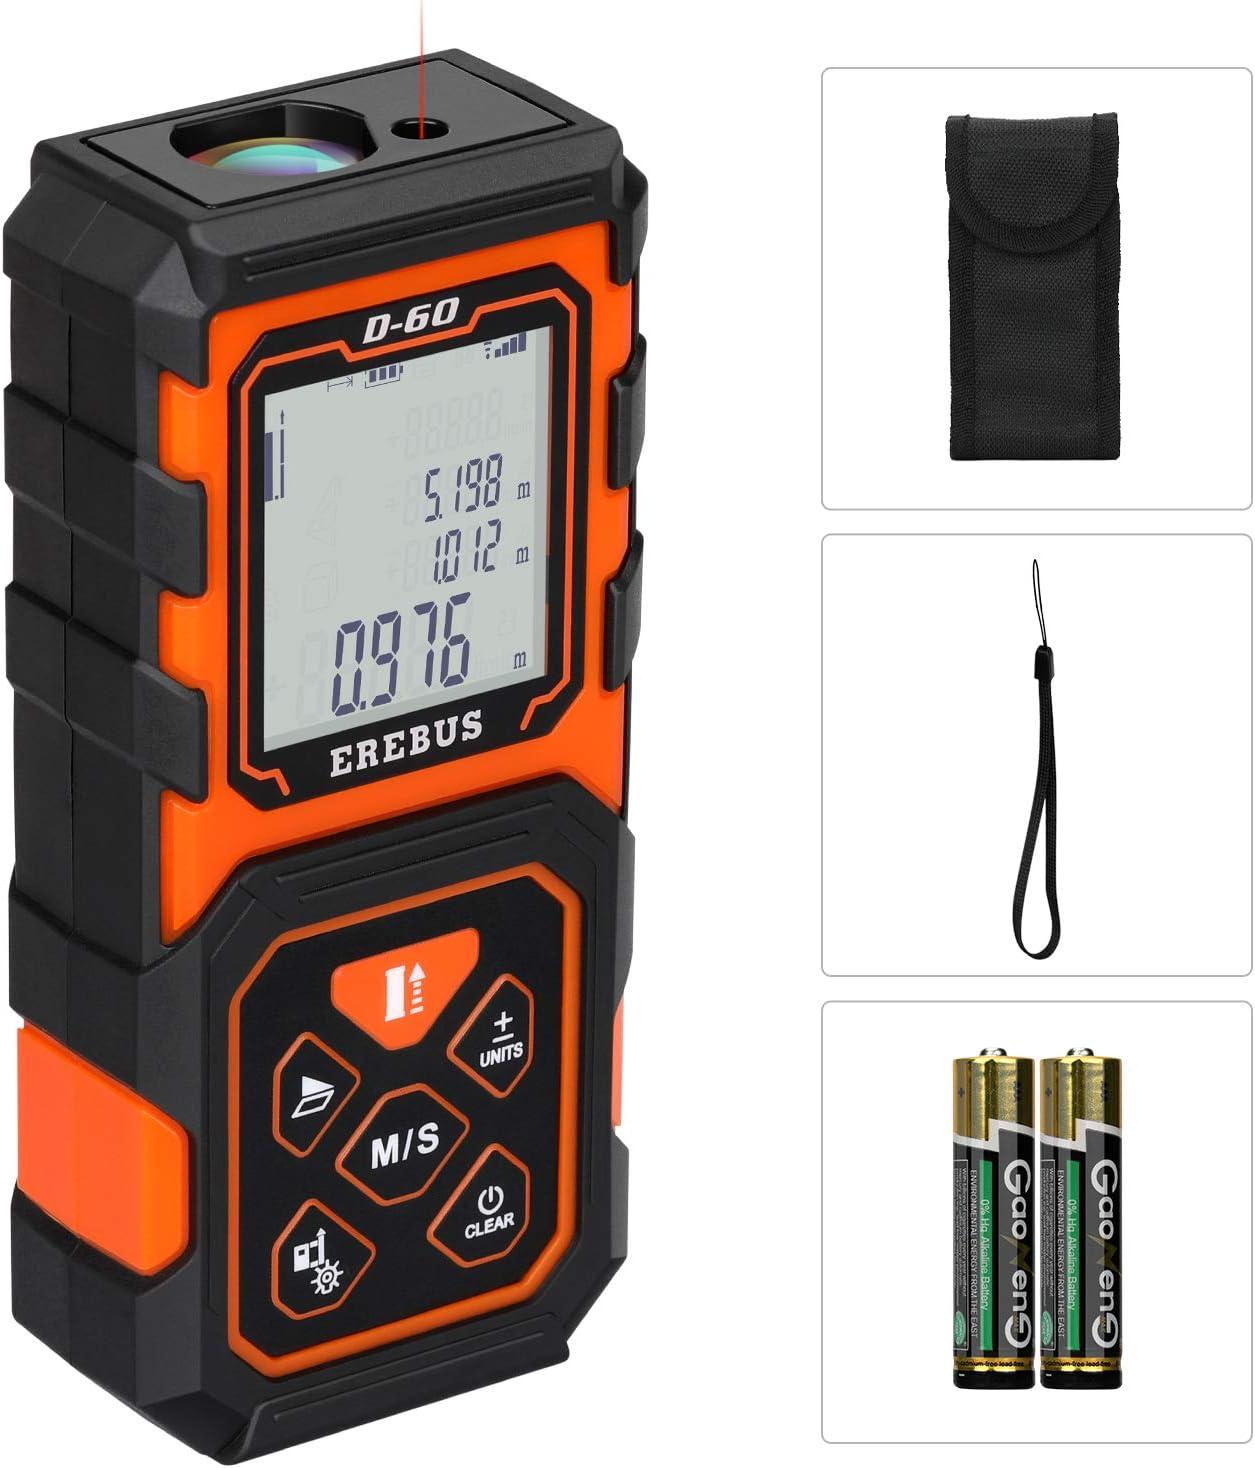 Erebus,D-60,Laser Distance Meters, Laser Distance Meter 196Ft/60M Digital Tape Measurement Werkzeug Measuring Device mit groß Backlit Display und 2Pcs Batteries